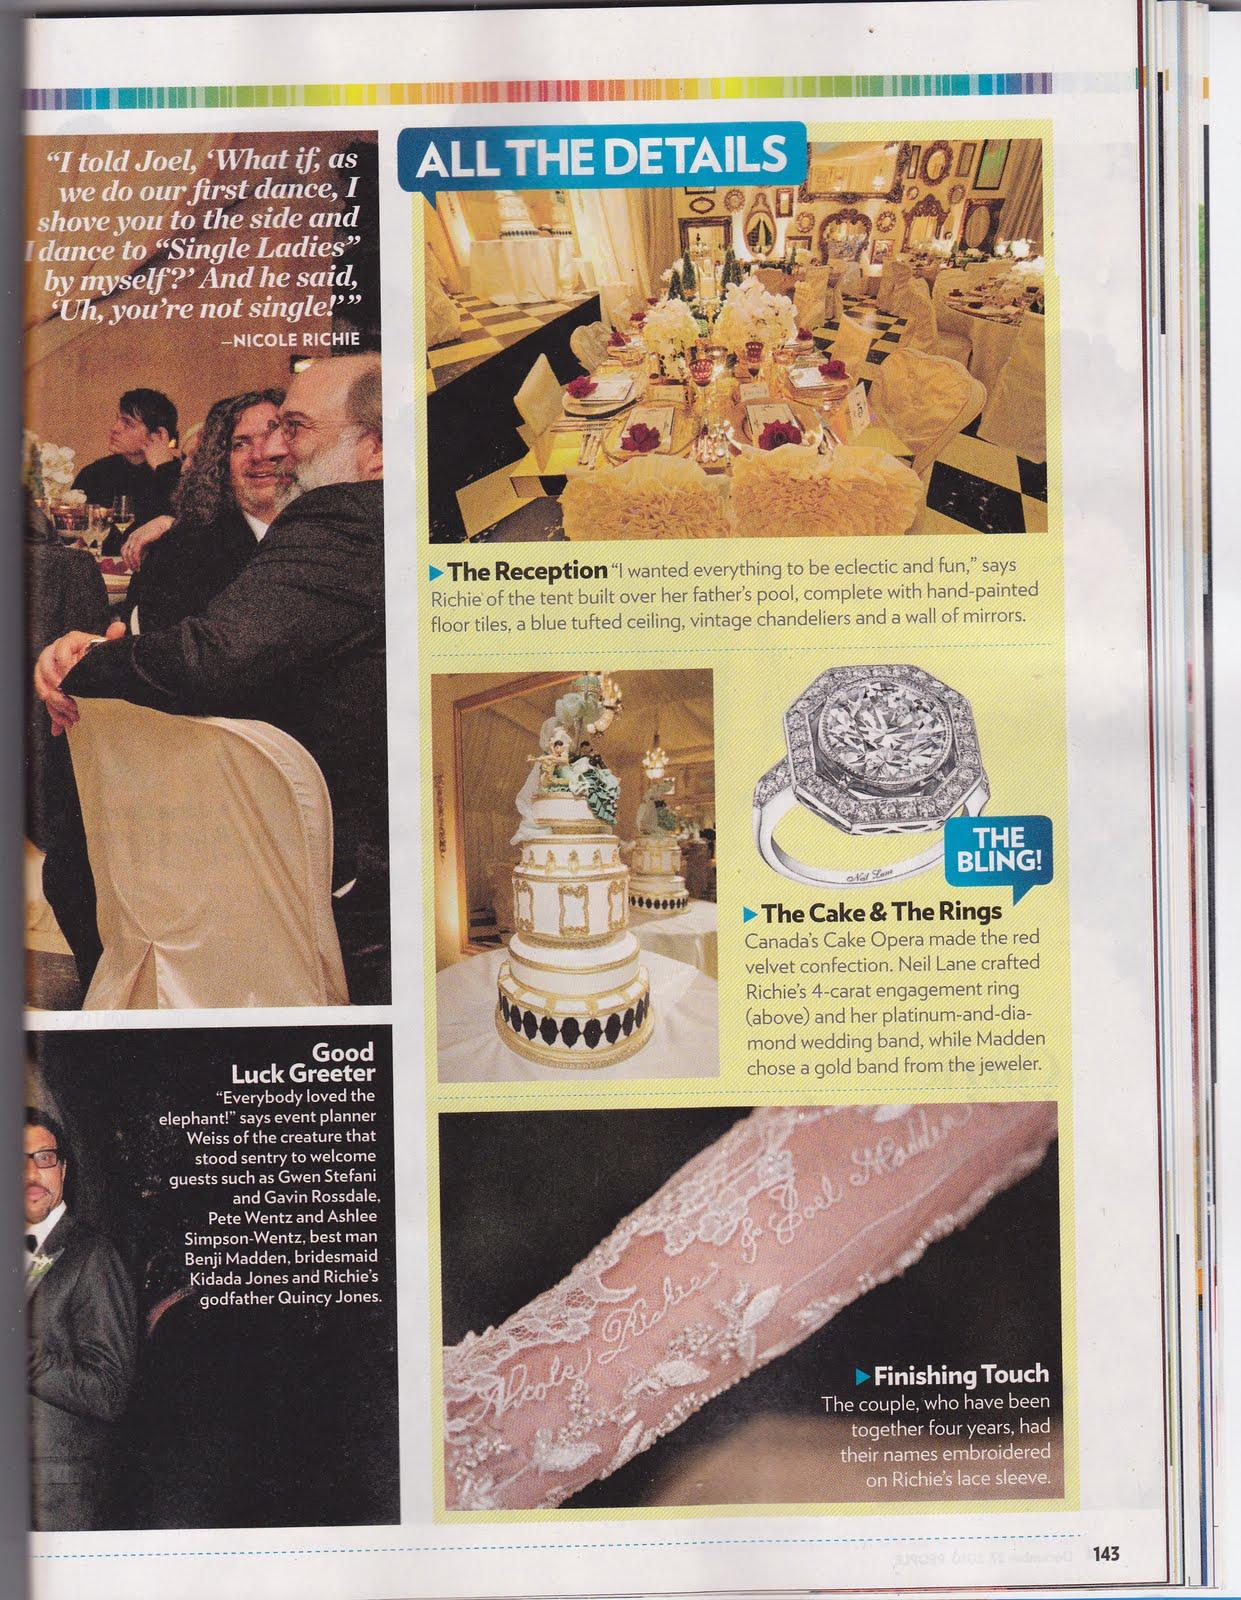 http://4.bp.blogspot.com/_ygRAqJeep-s/TQyu2xxuwwI/AAAAAAAAHfQ/nhlZNvu8z5o/s1600/nicole-richie-joel-madden-people-magazine-wedding-4.jpg